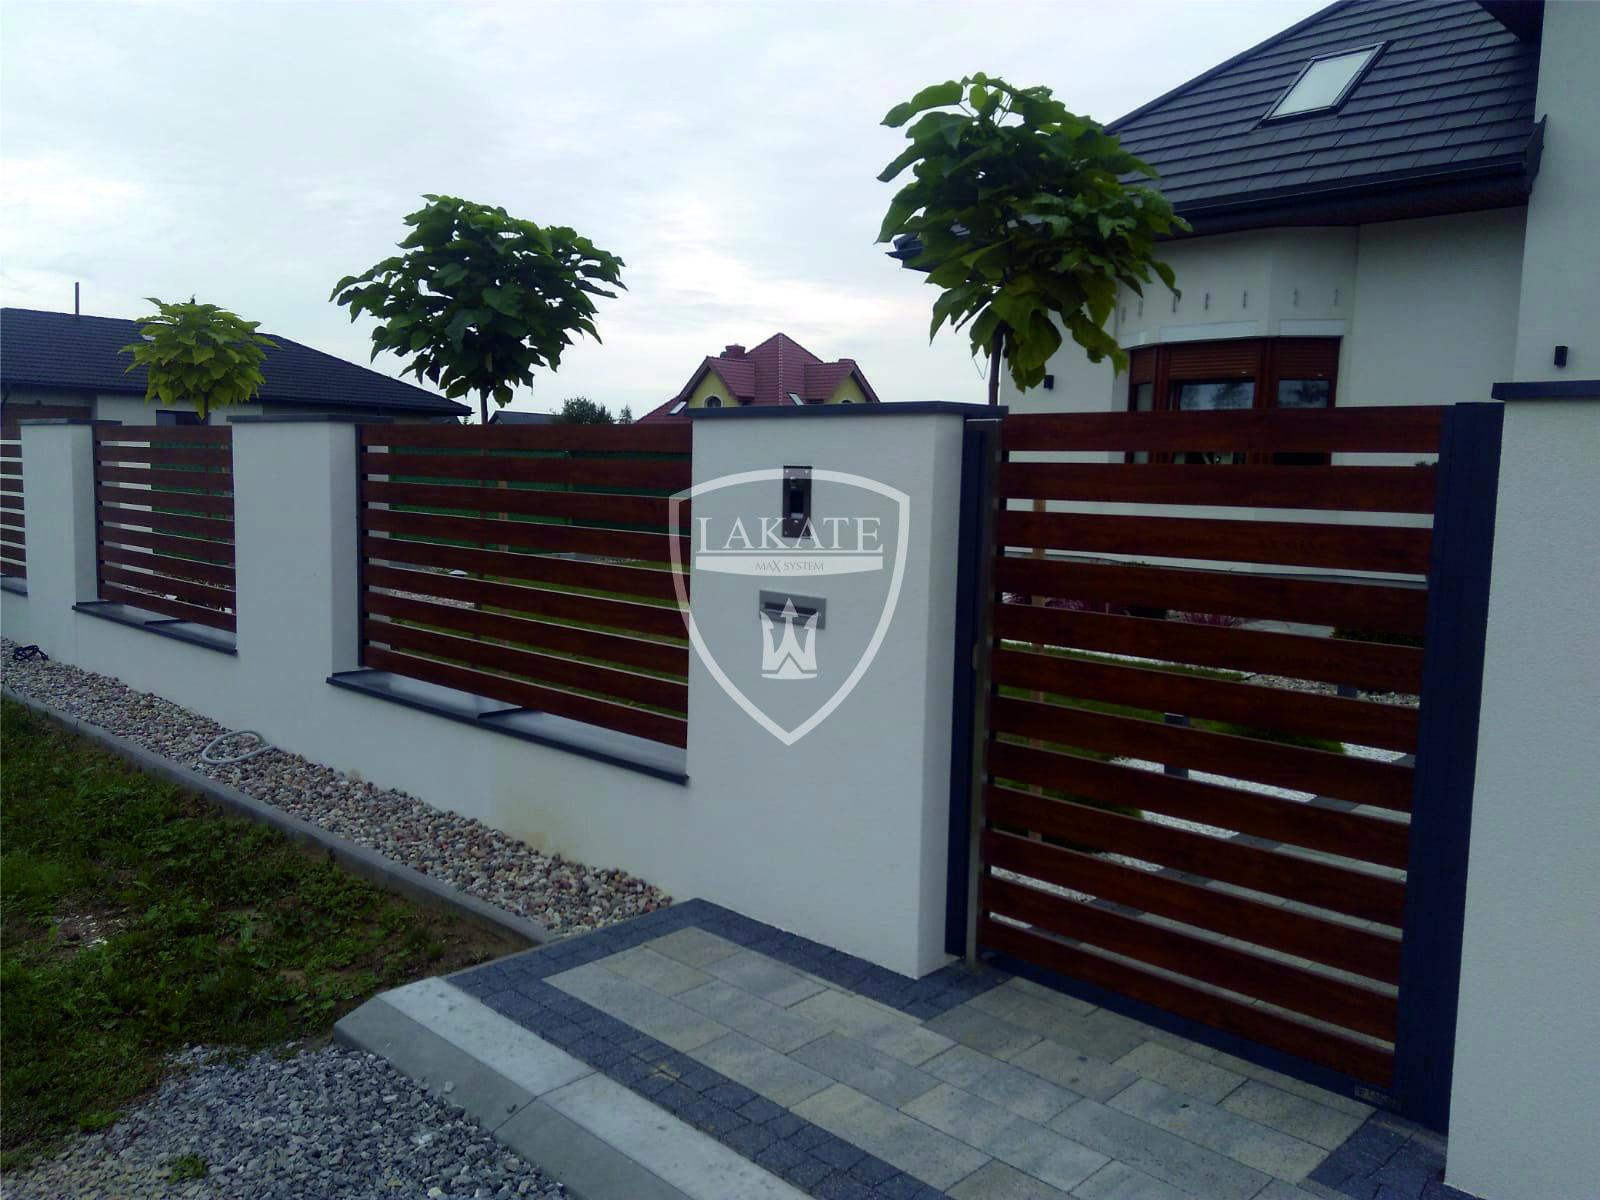 ogrodzenia-aluminiowe-lakate